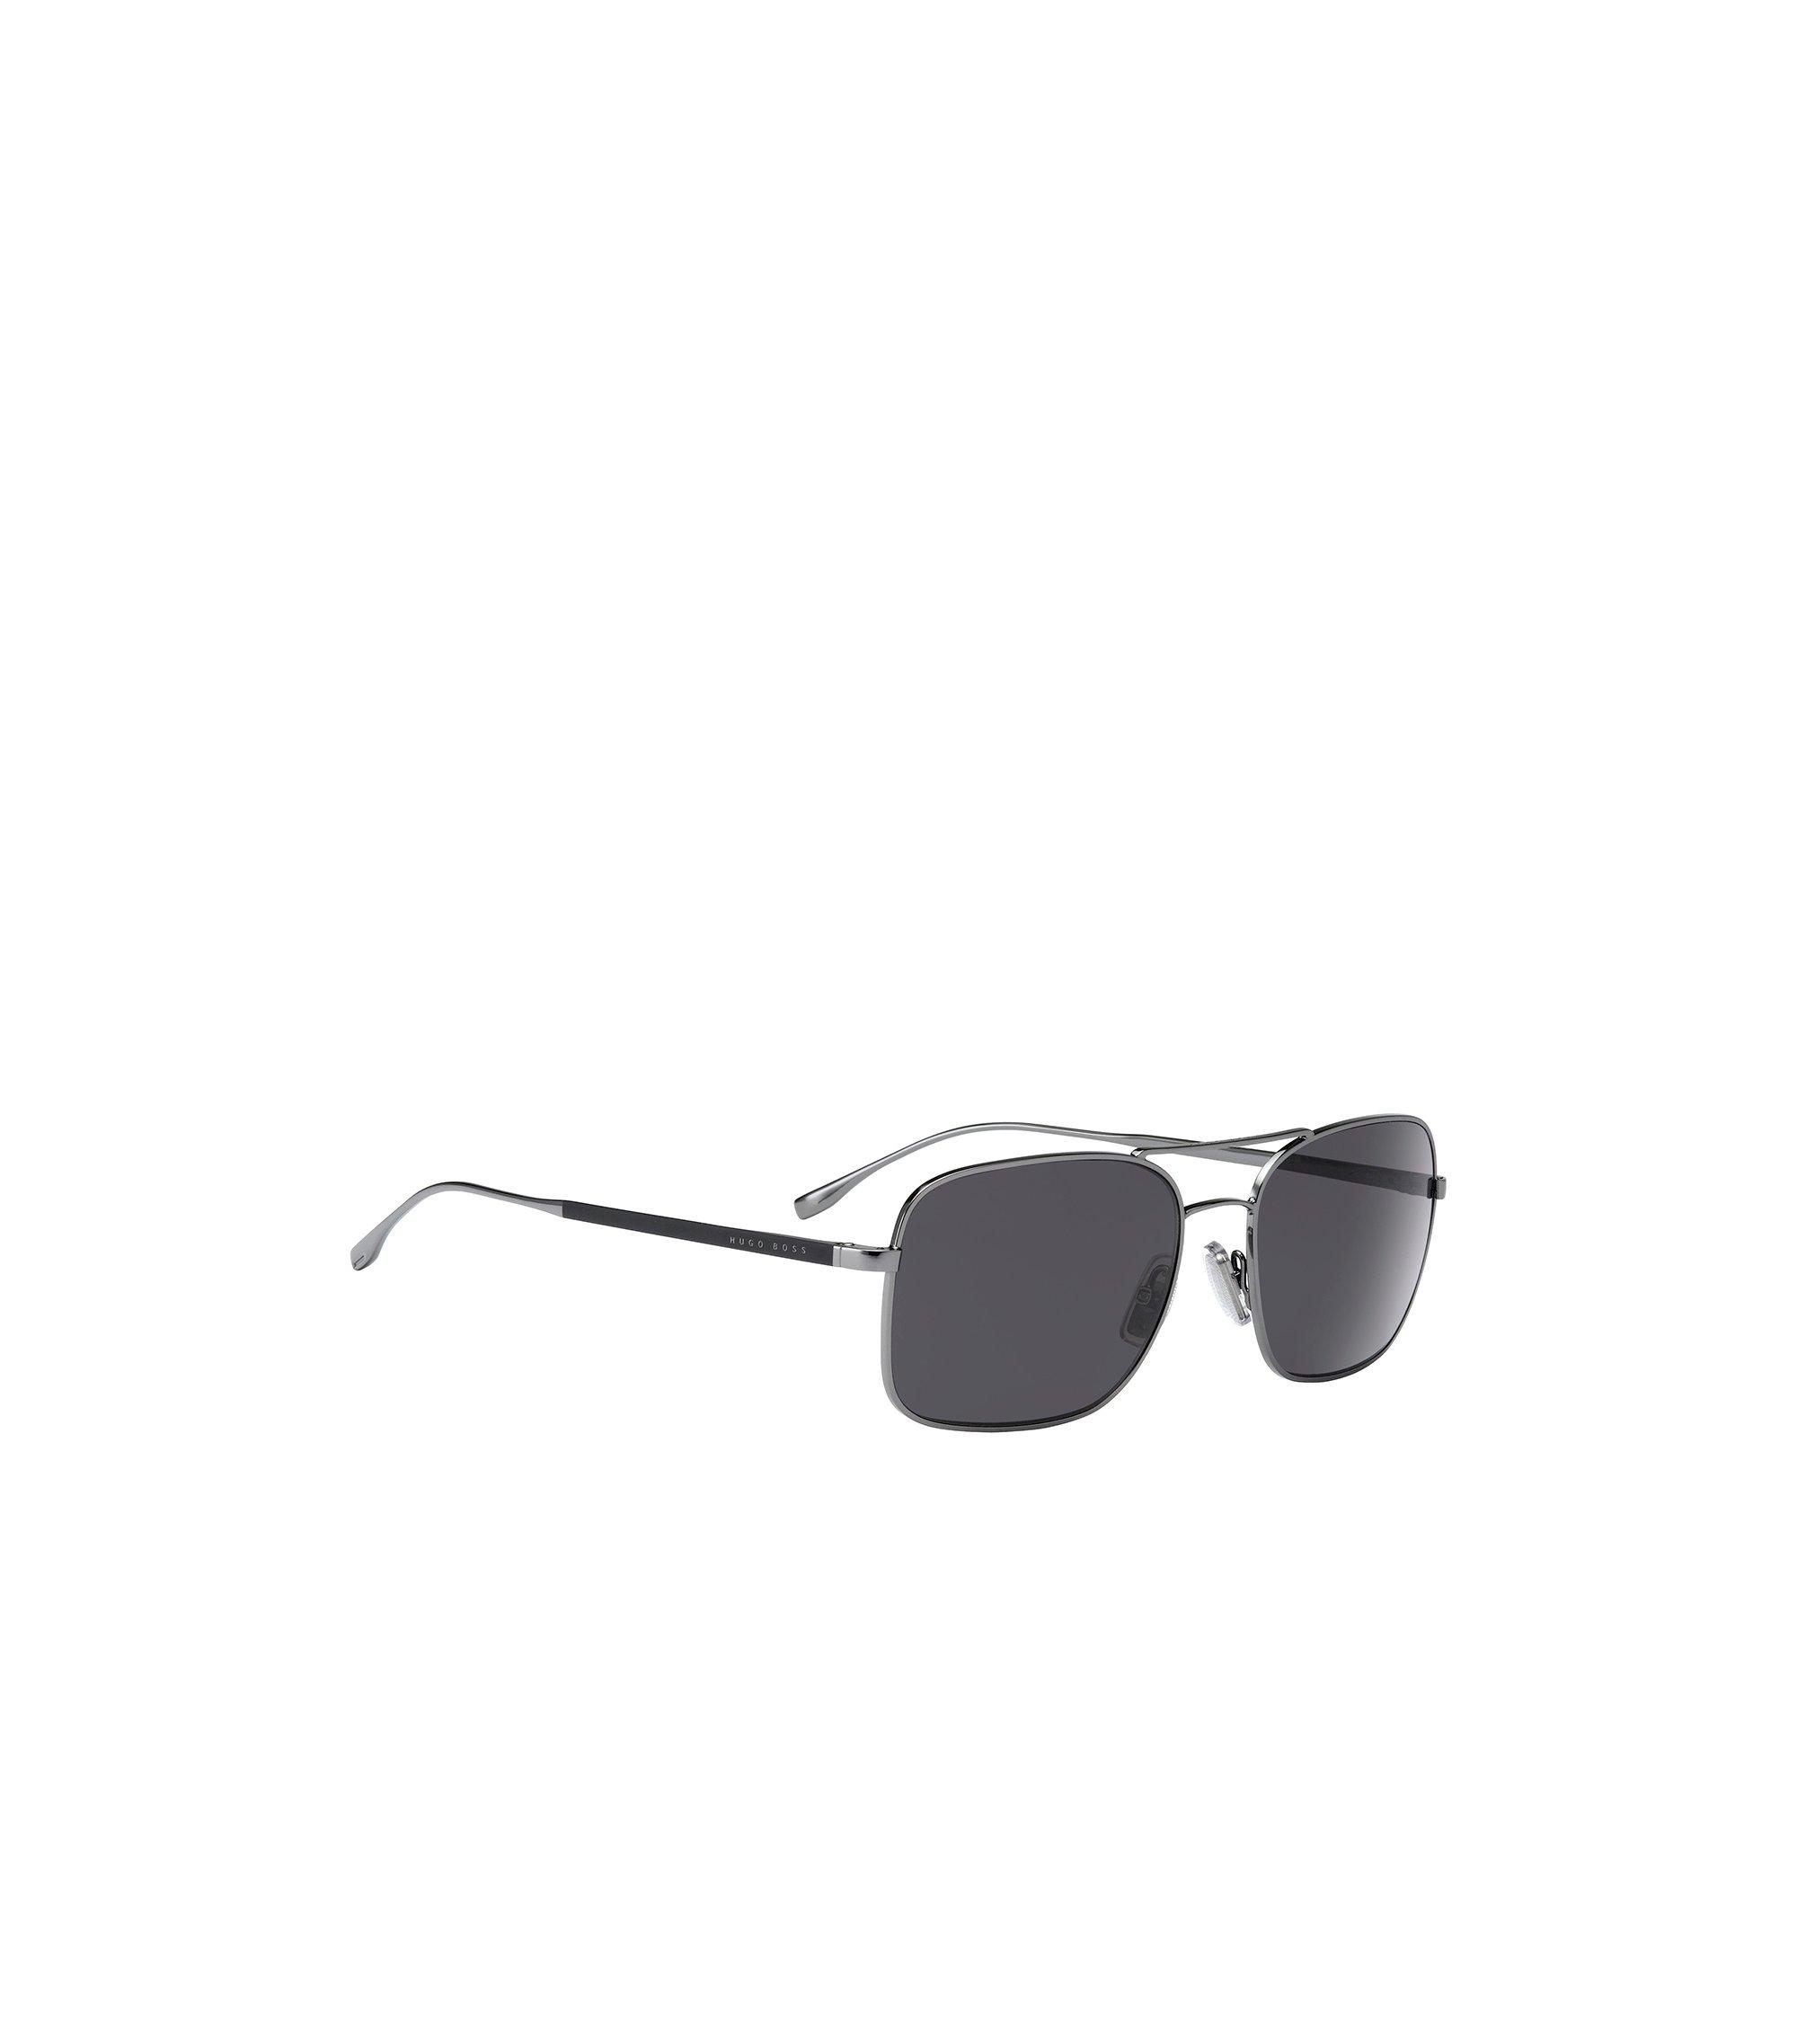 Gray Lens Caravan Sunglasses | BOSS 0781, Assorted-Pre-Pack